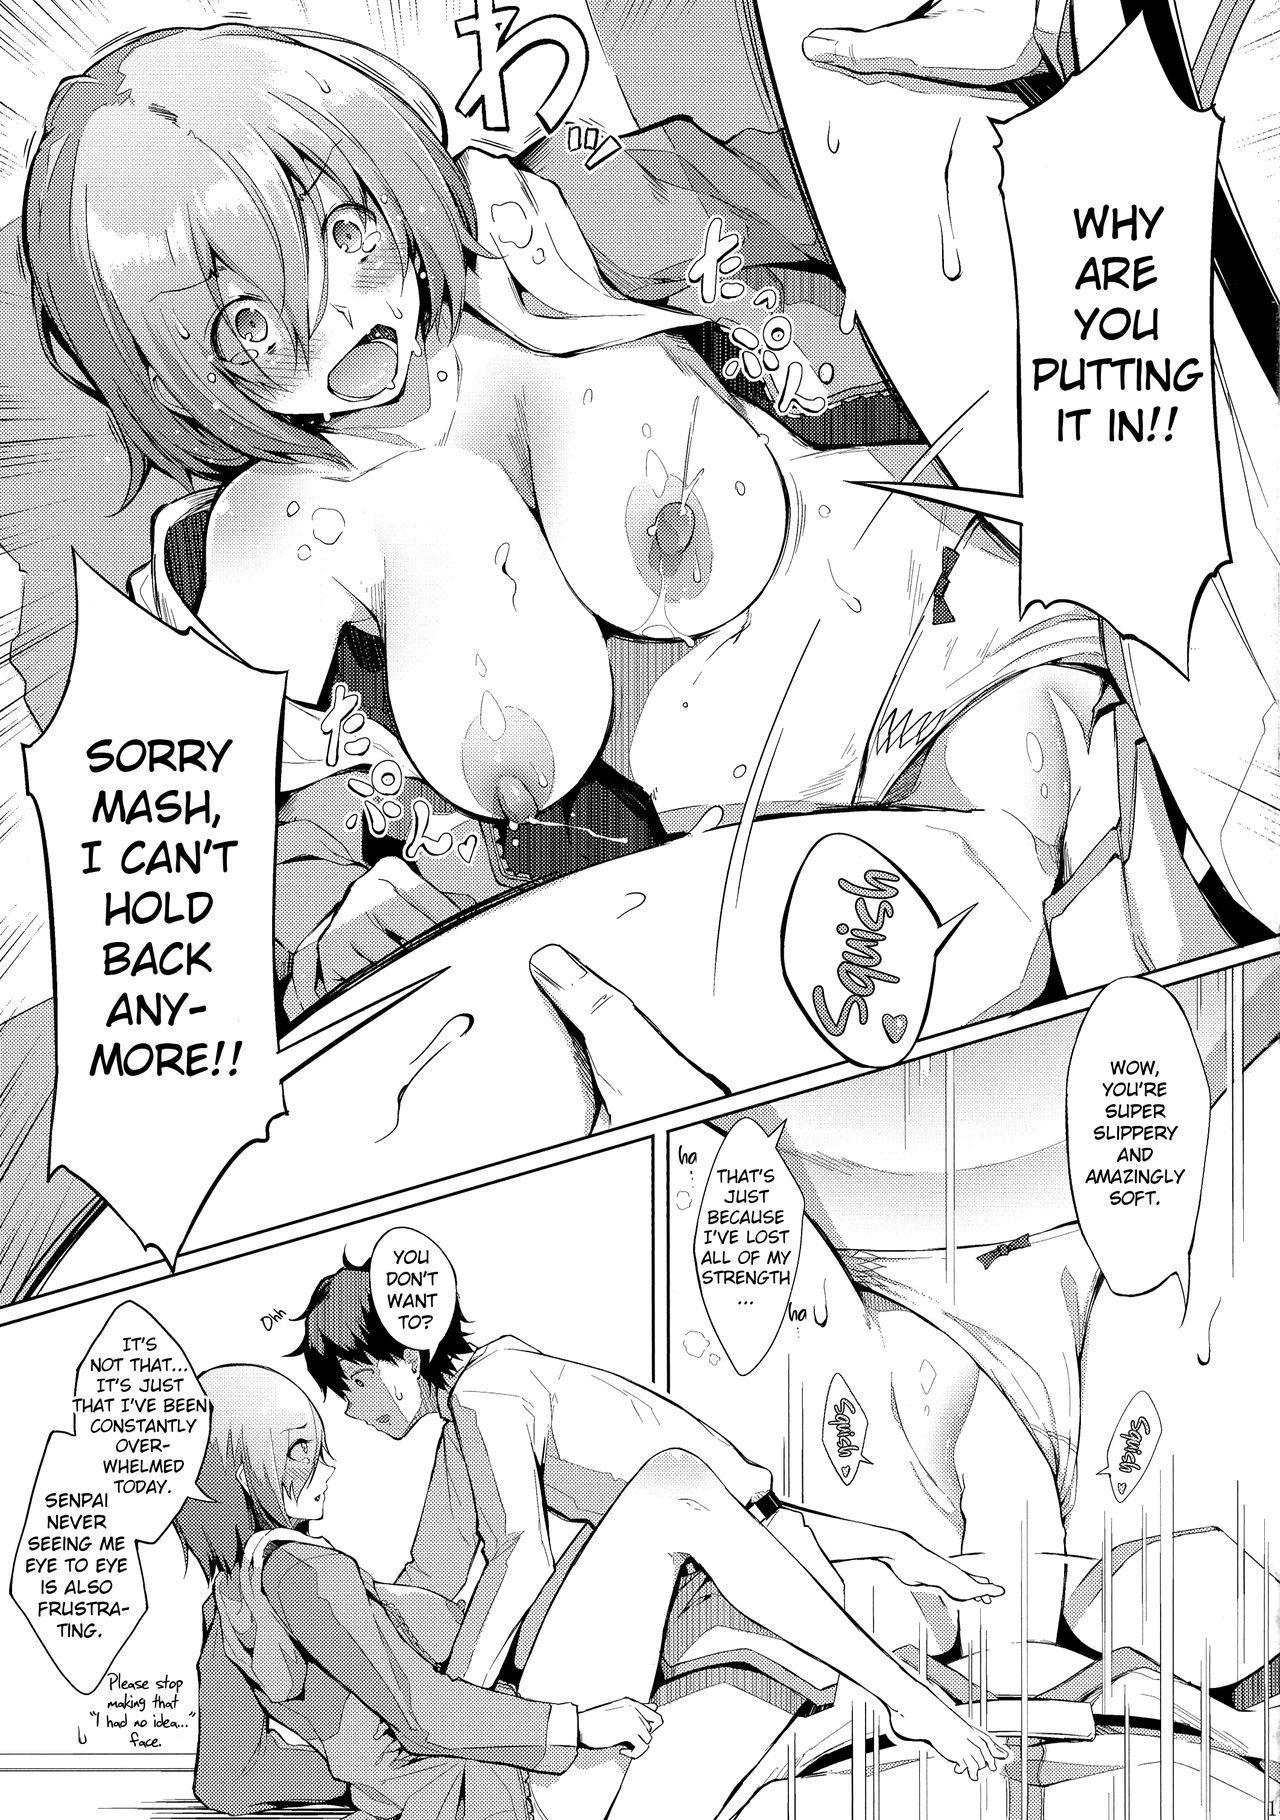 Oppai wa Daini Skill no Aji ga Suru | Boobs Taste Like the Second Skill 16